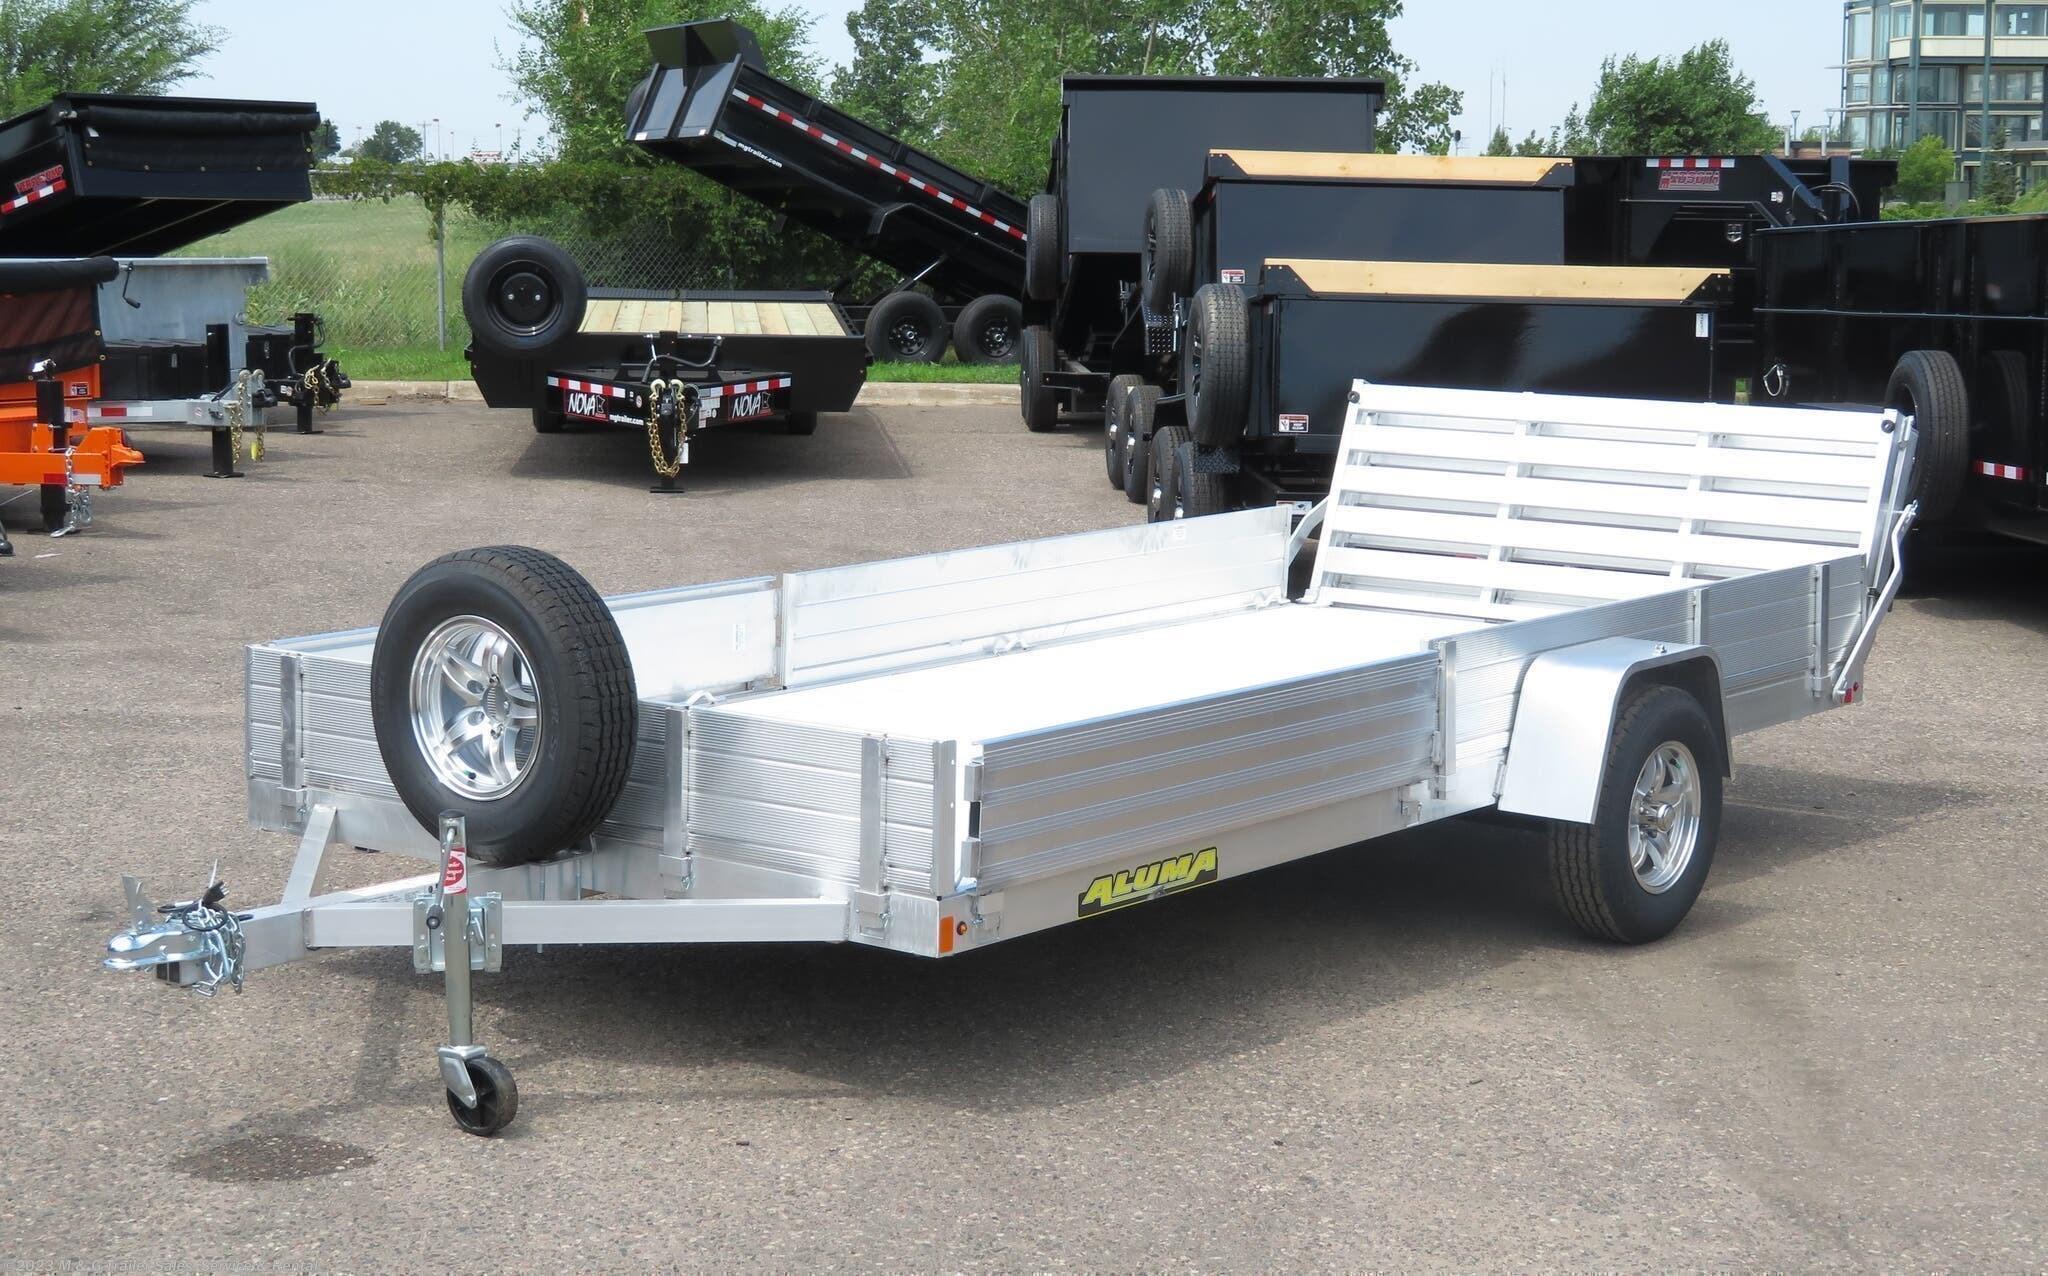 2022 Aluma 8114 SR Aluminum ATV/Utility Trailer - Stock #244062